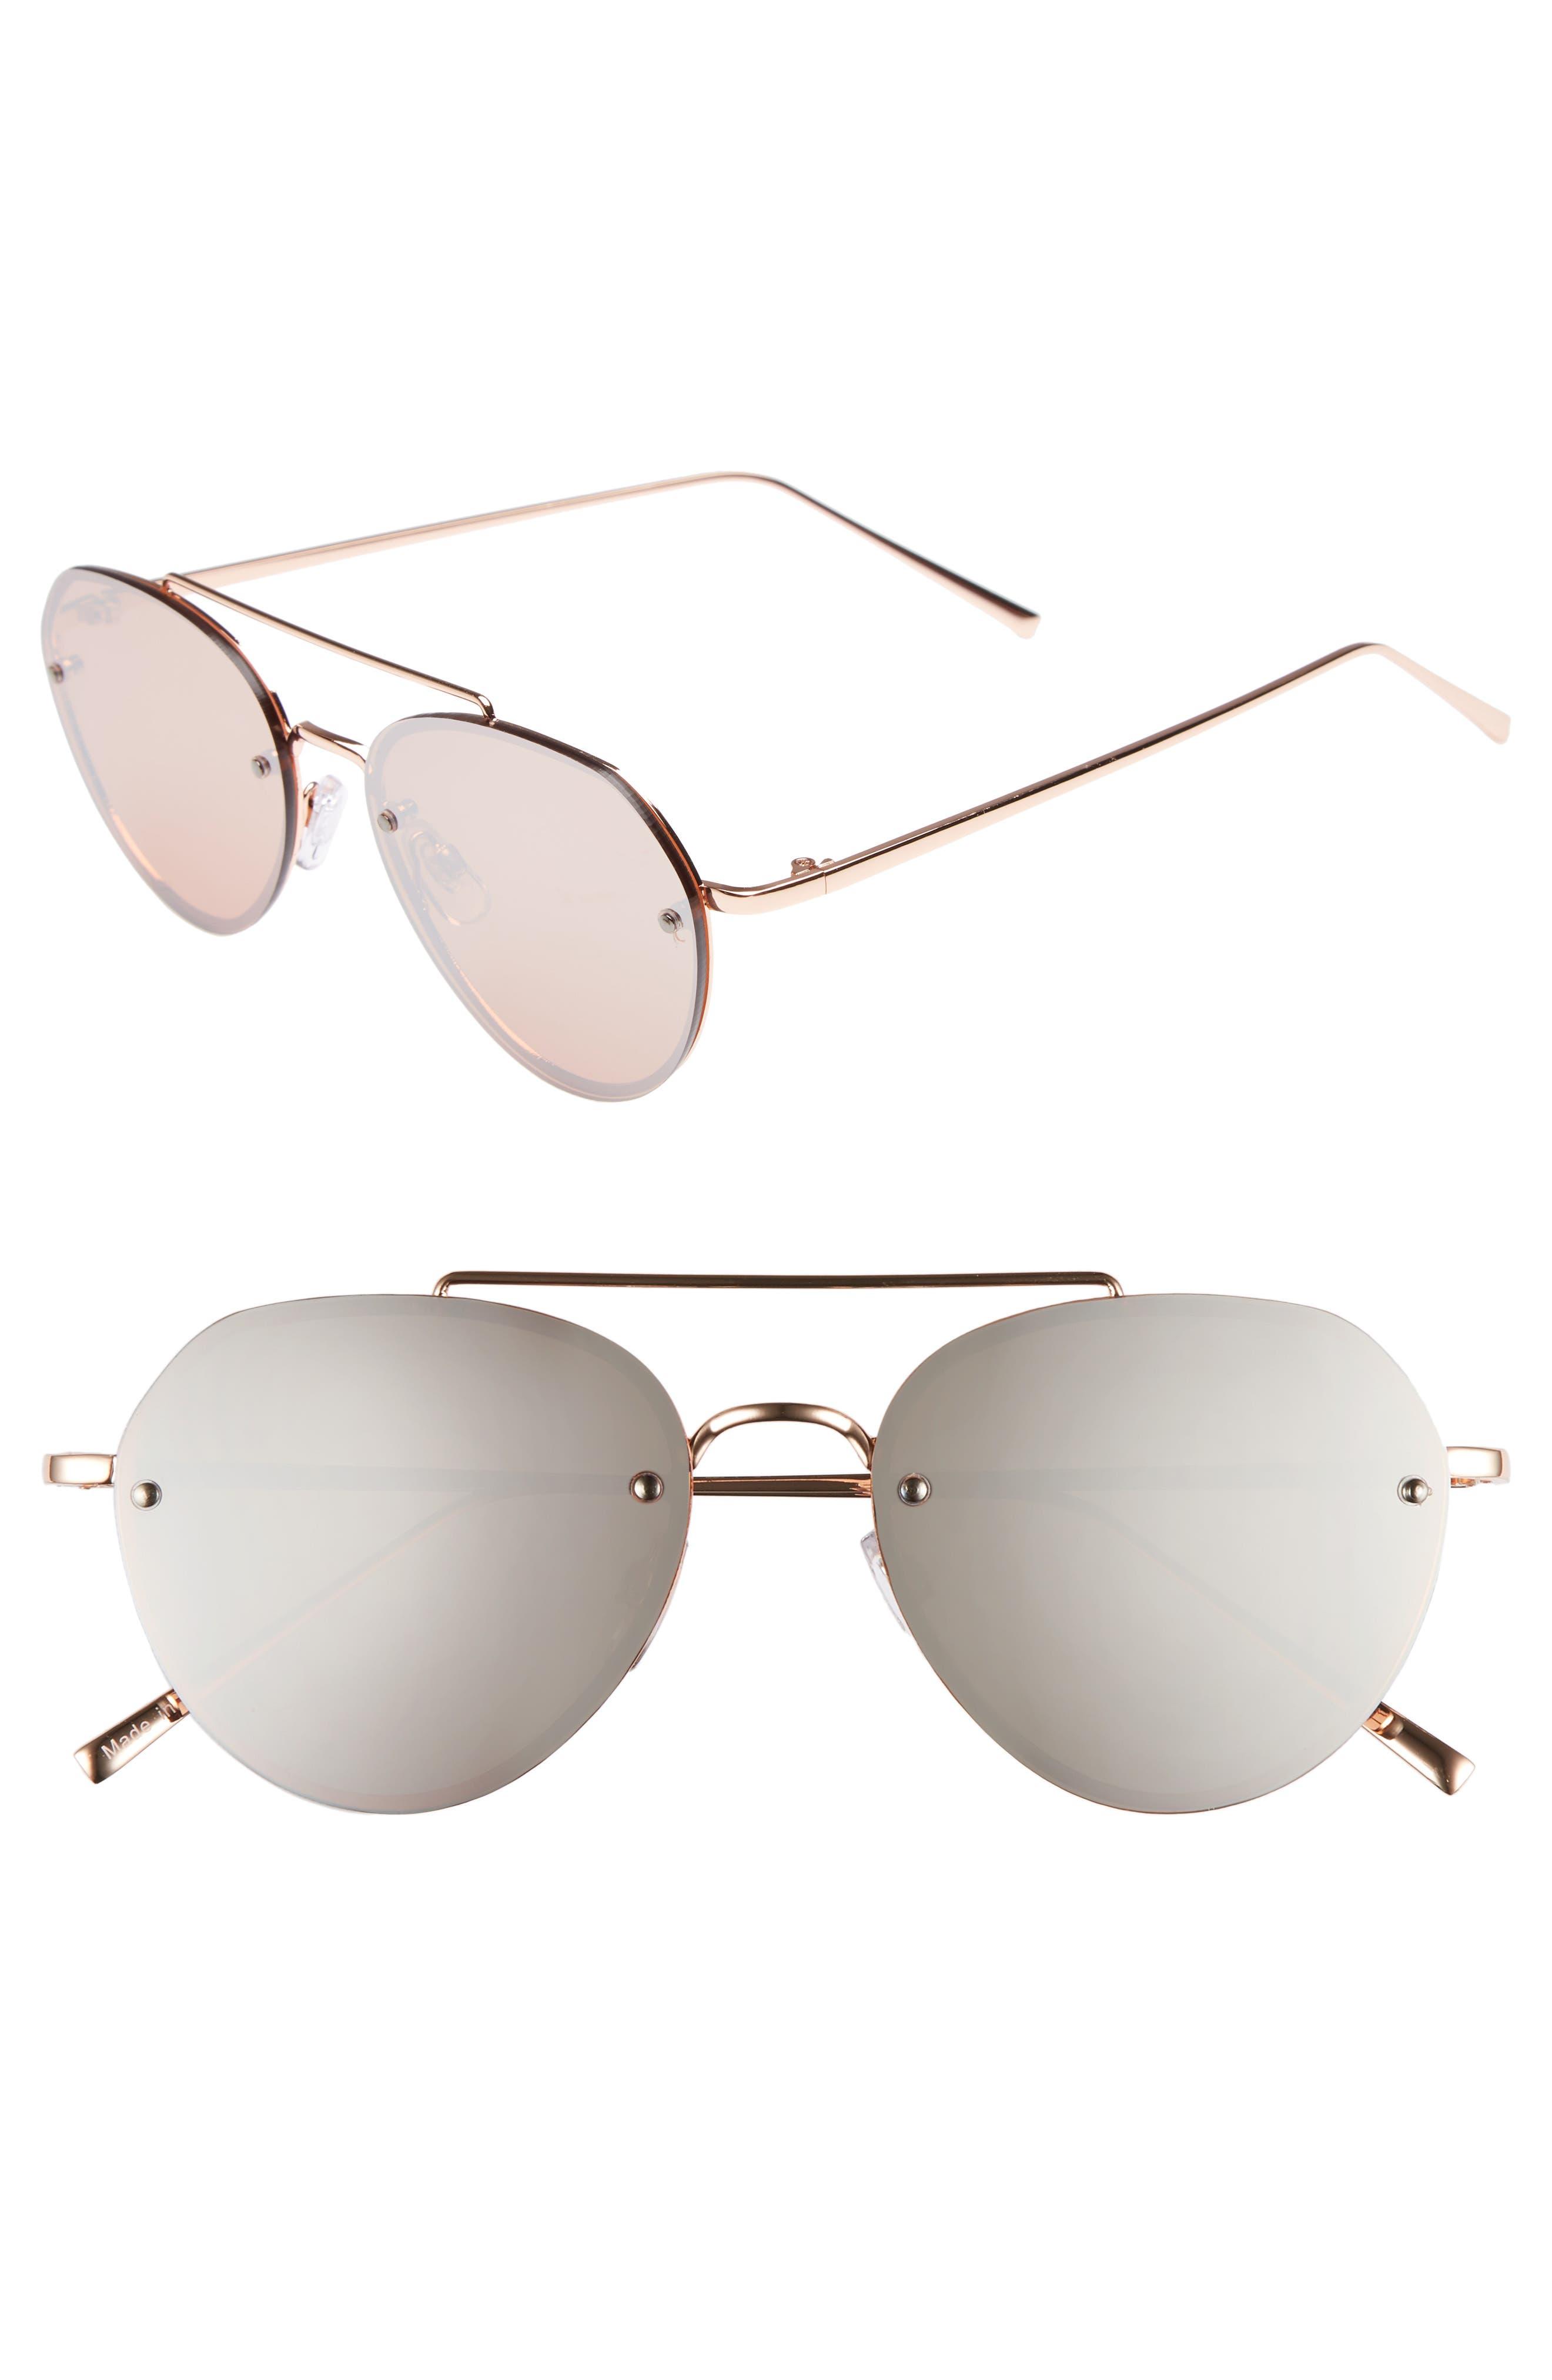 Gradient Petite Aviator Sunglasses,                             Main thumbnail 1, color,                             ROSE / GOLD